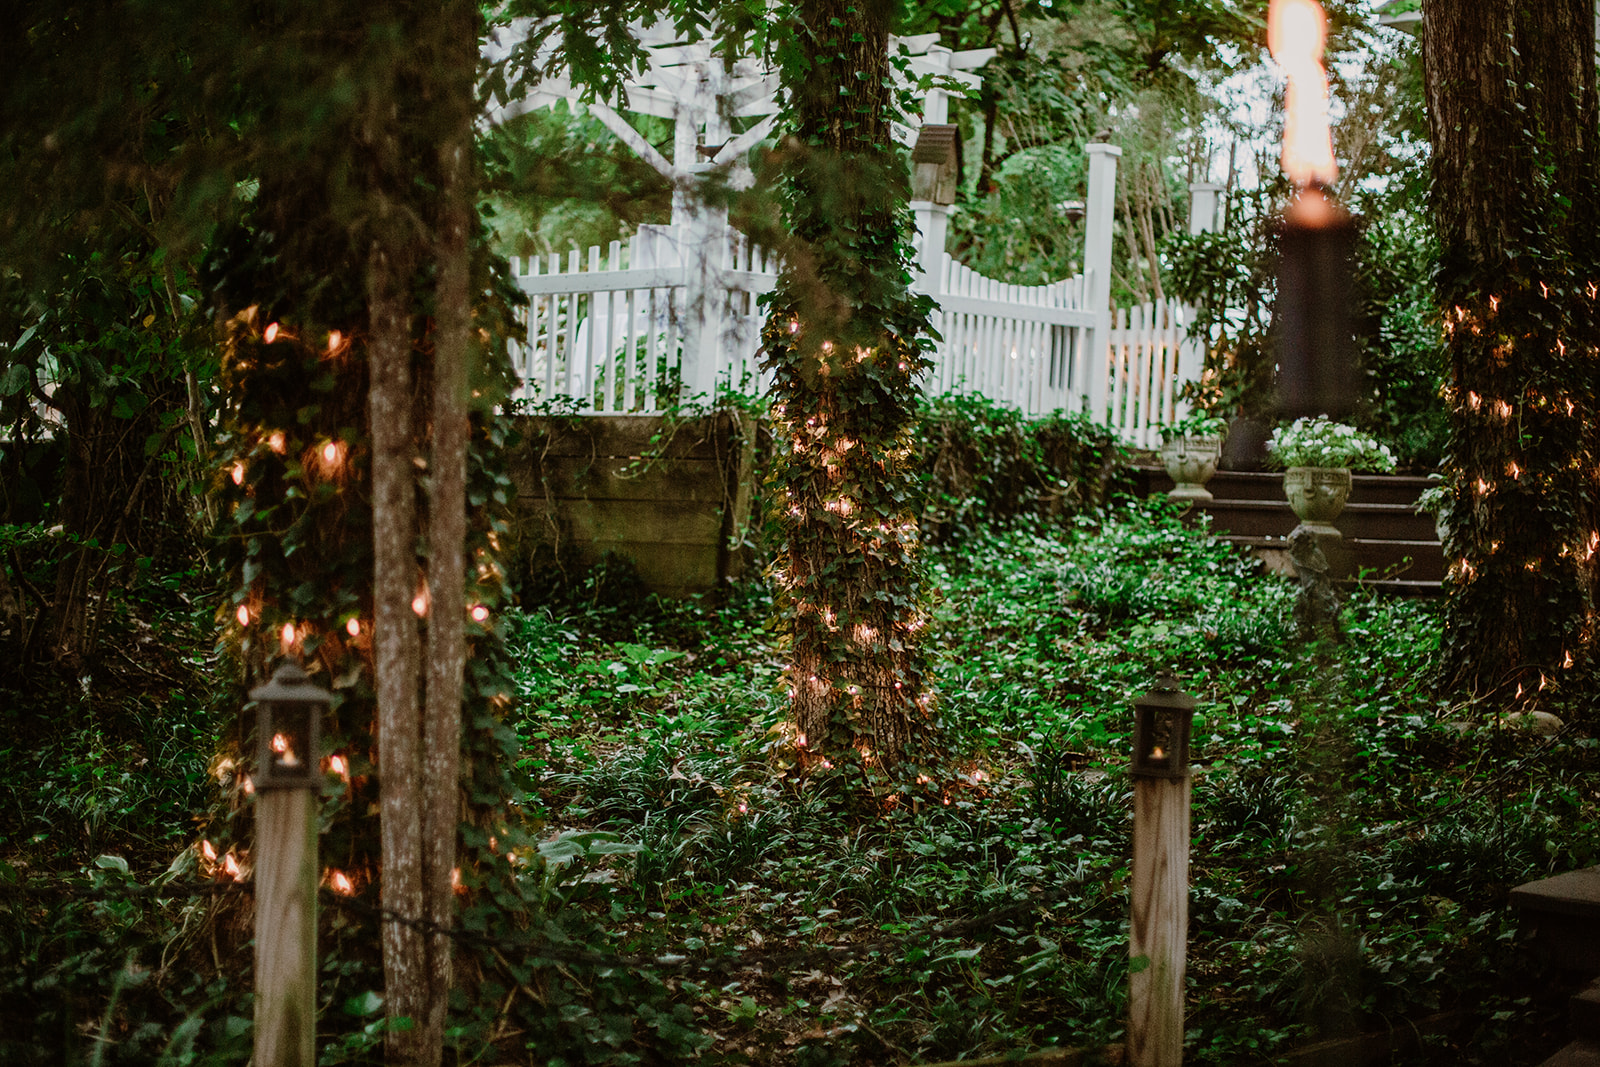 SarahMattozziPhotography-NicoleChris-GlenGardens-Reception-7.jpg